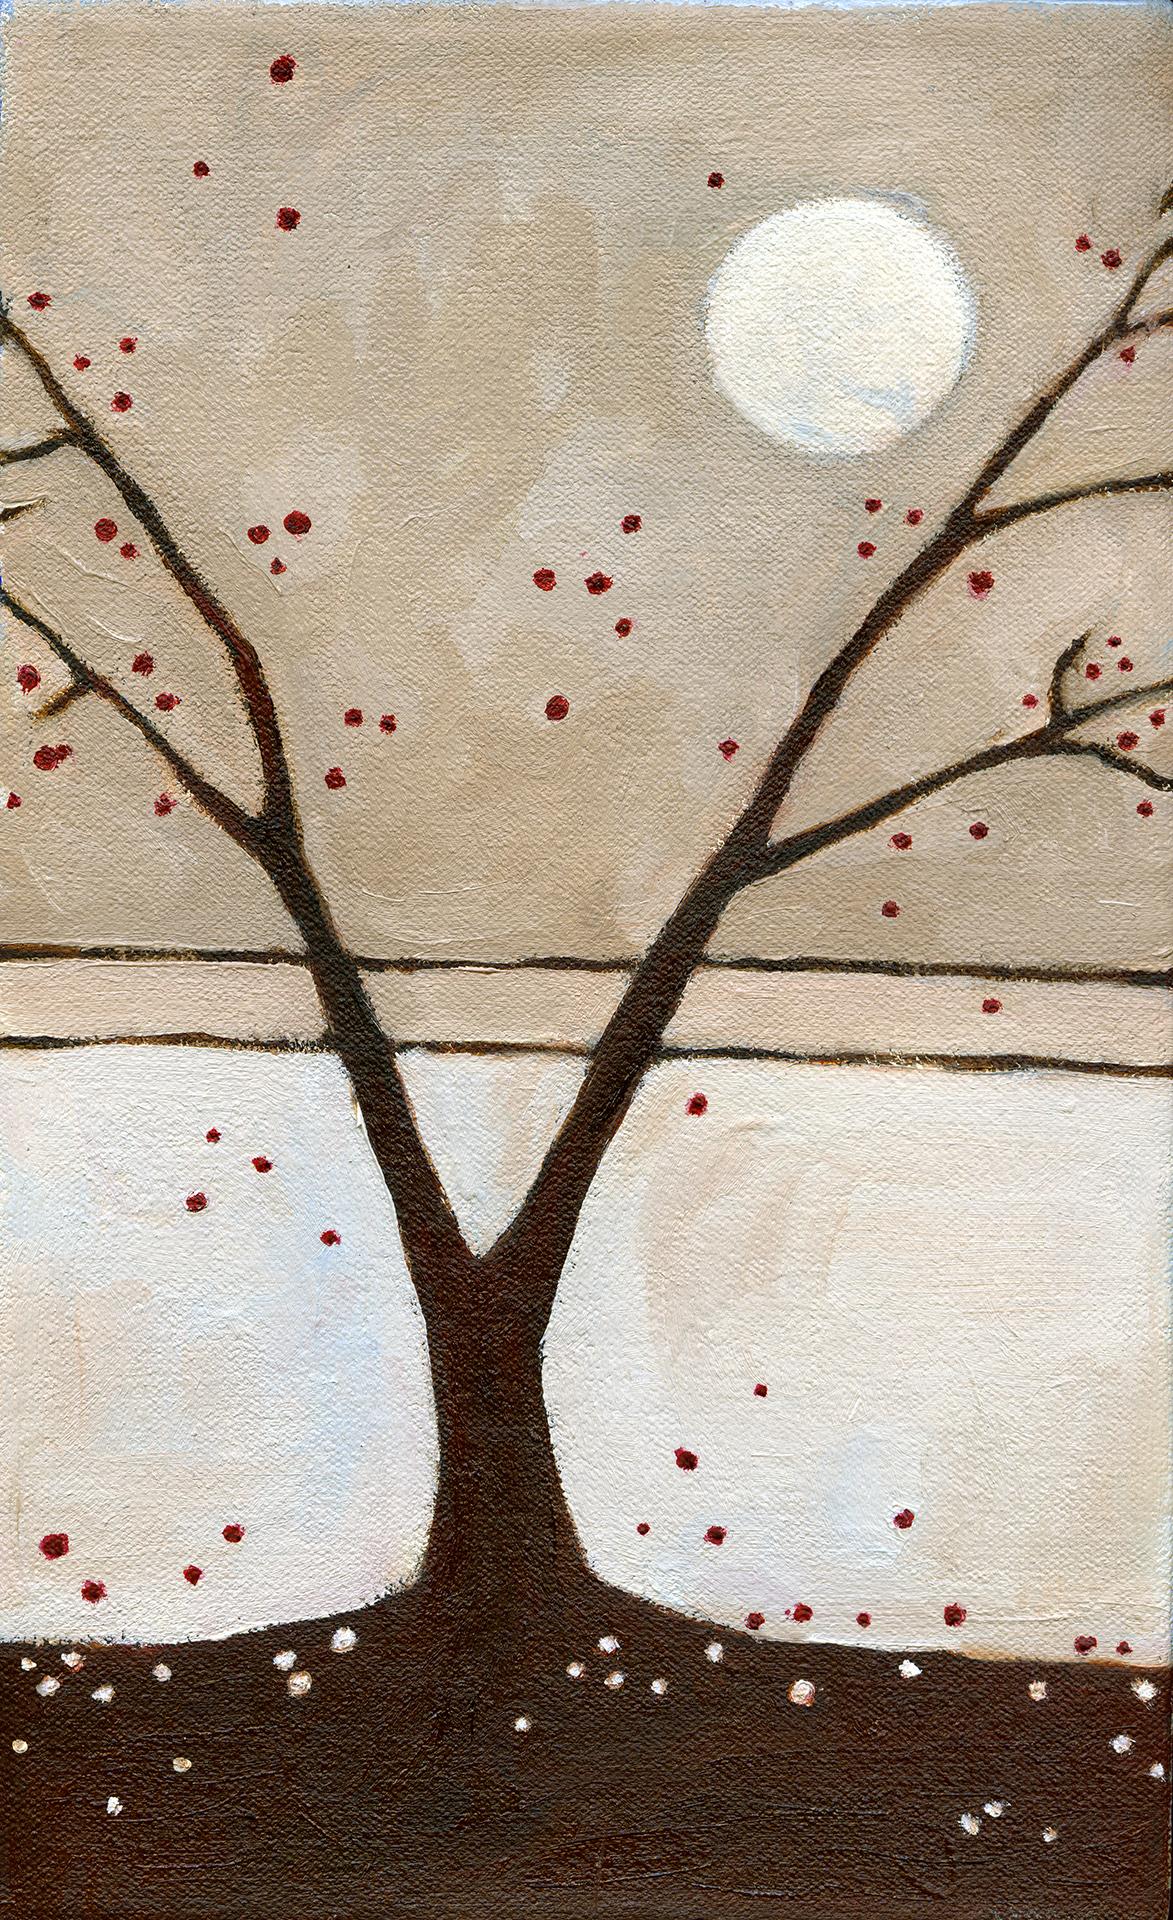 Winter Tree (Lake Calhoun)